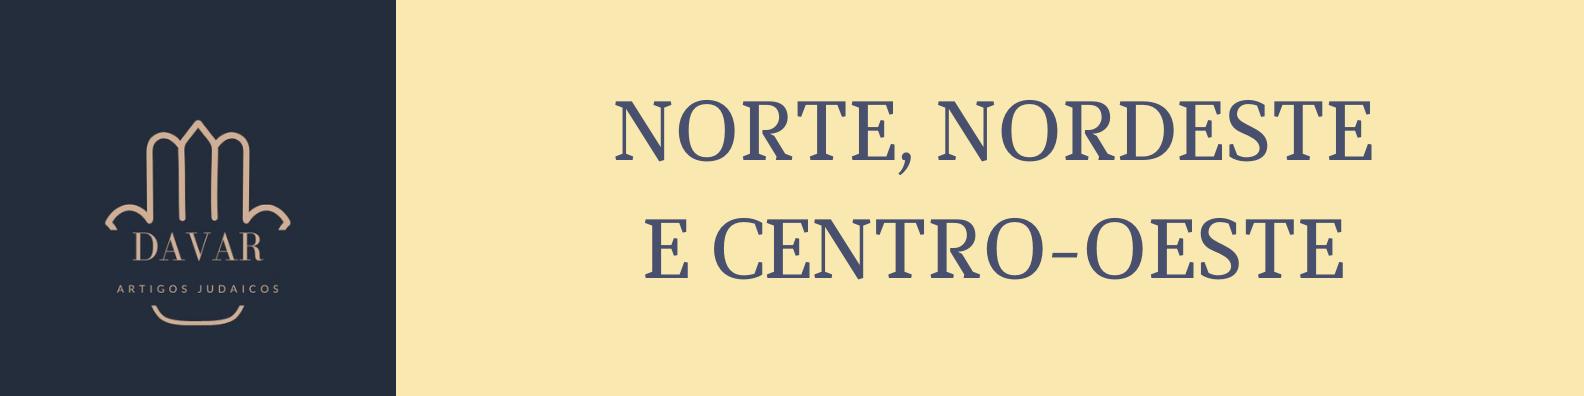 N & NE & CO